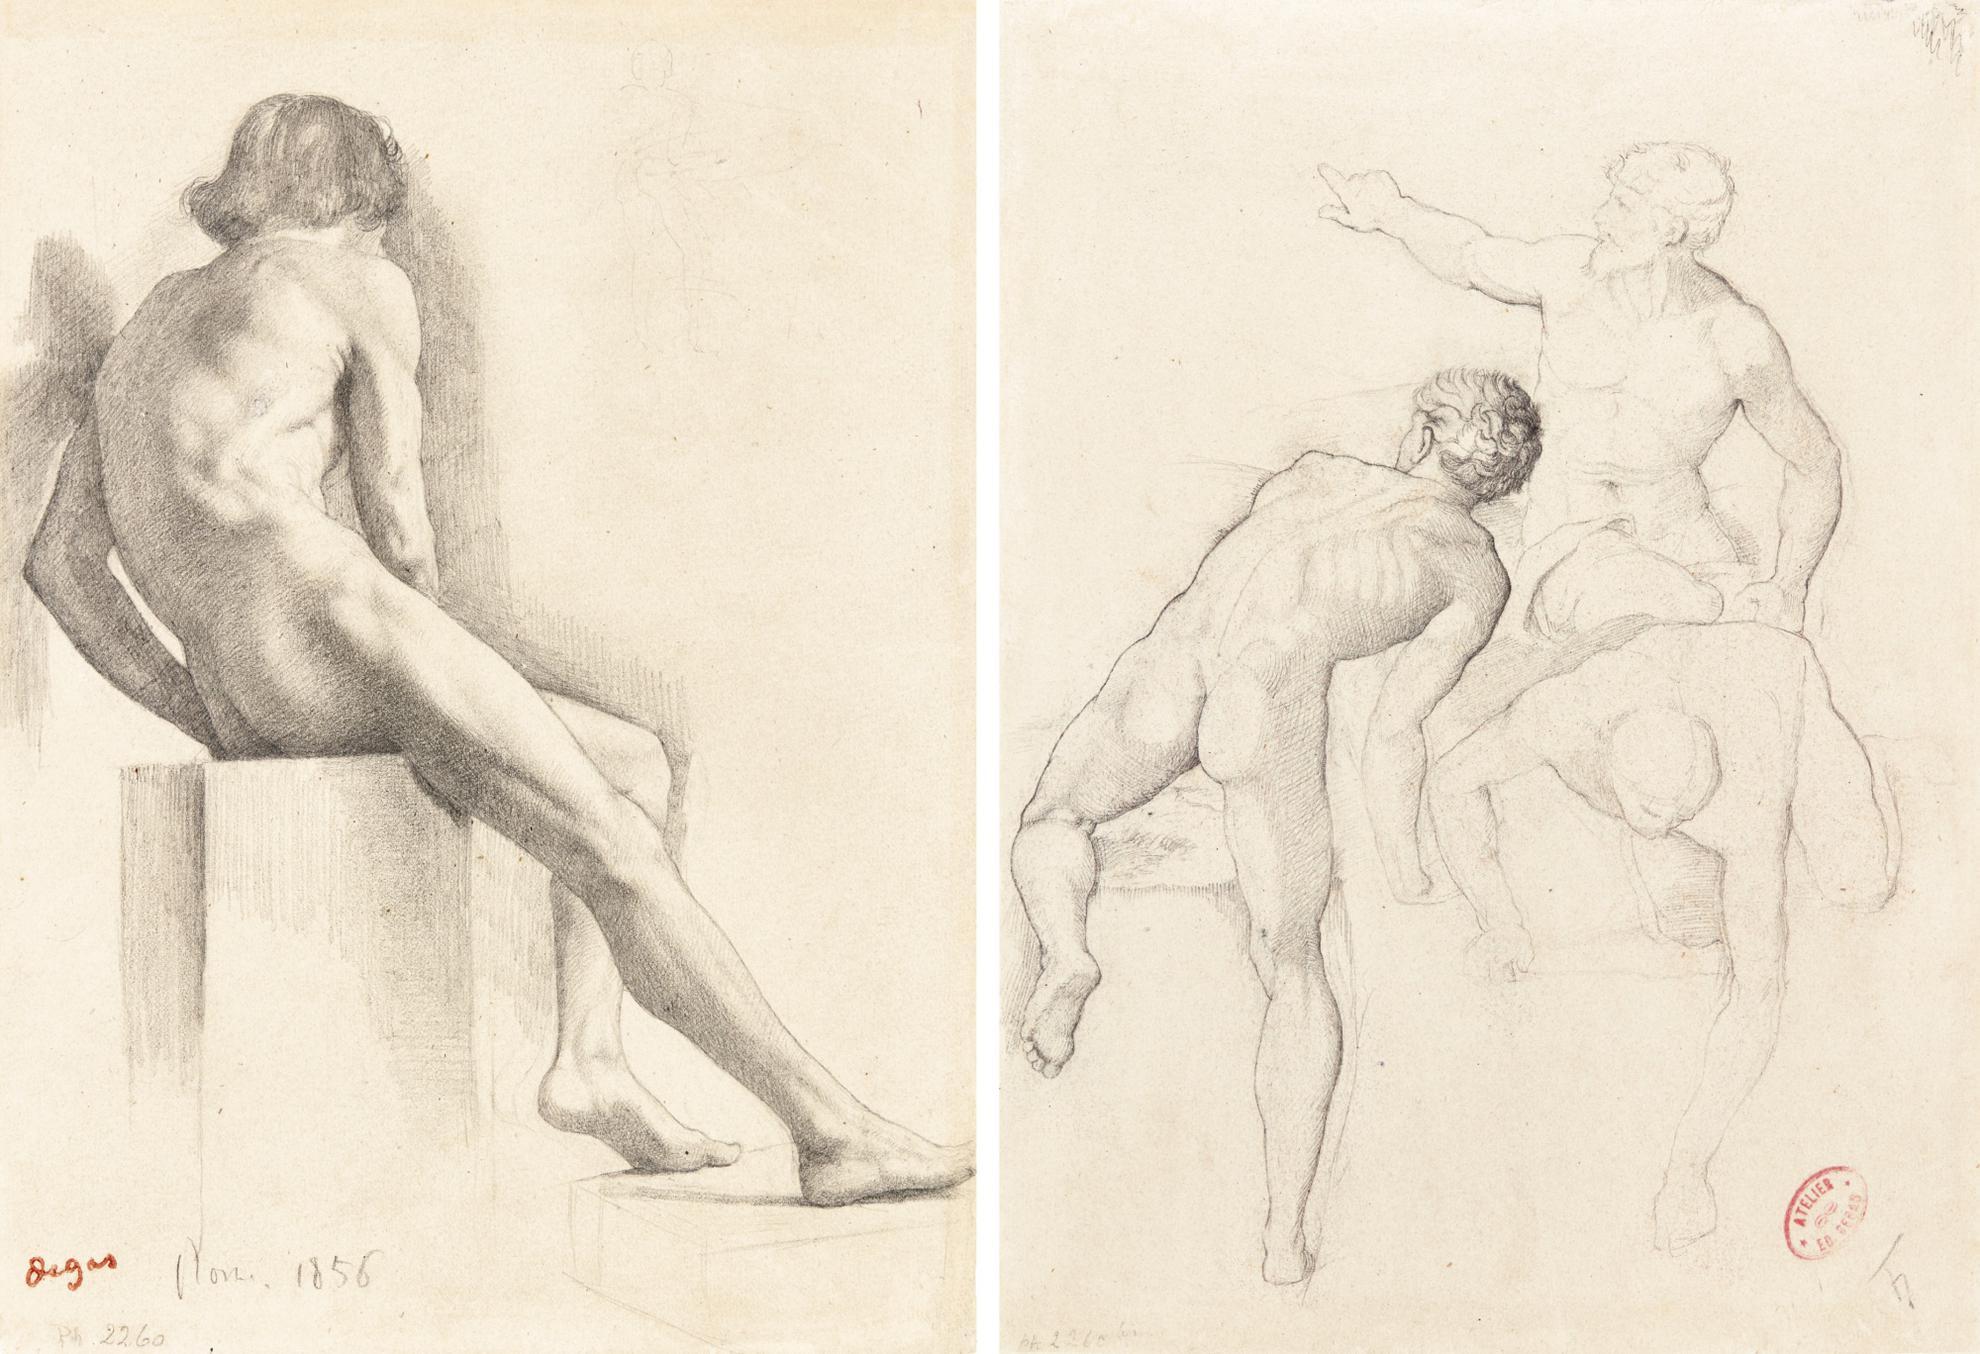 Edgar Degas-Homme Nu Assis - Recto Etude Dhommes - Verso-1856